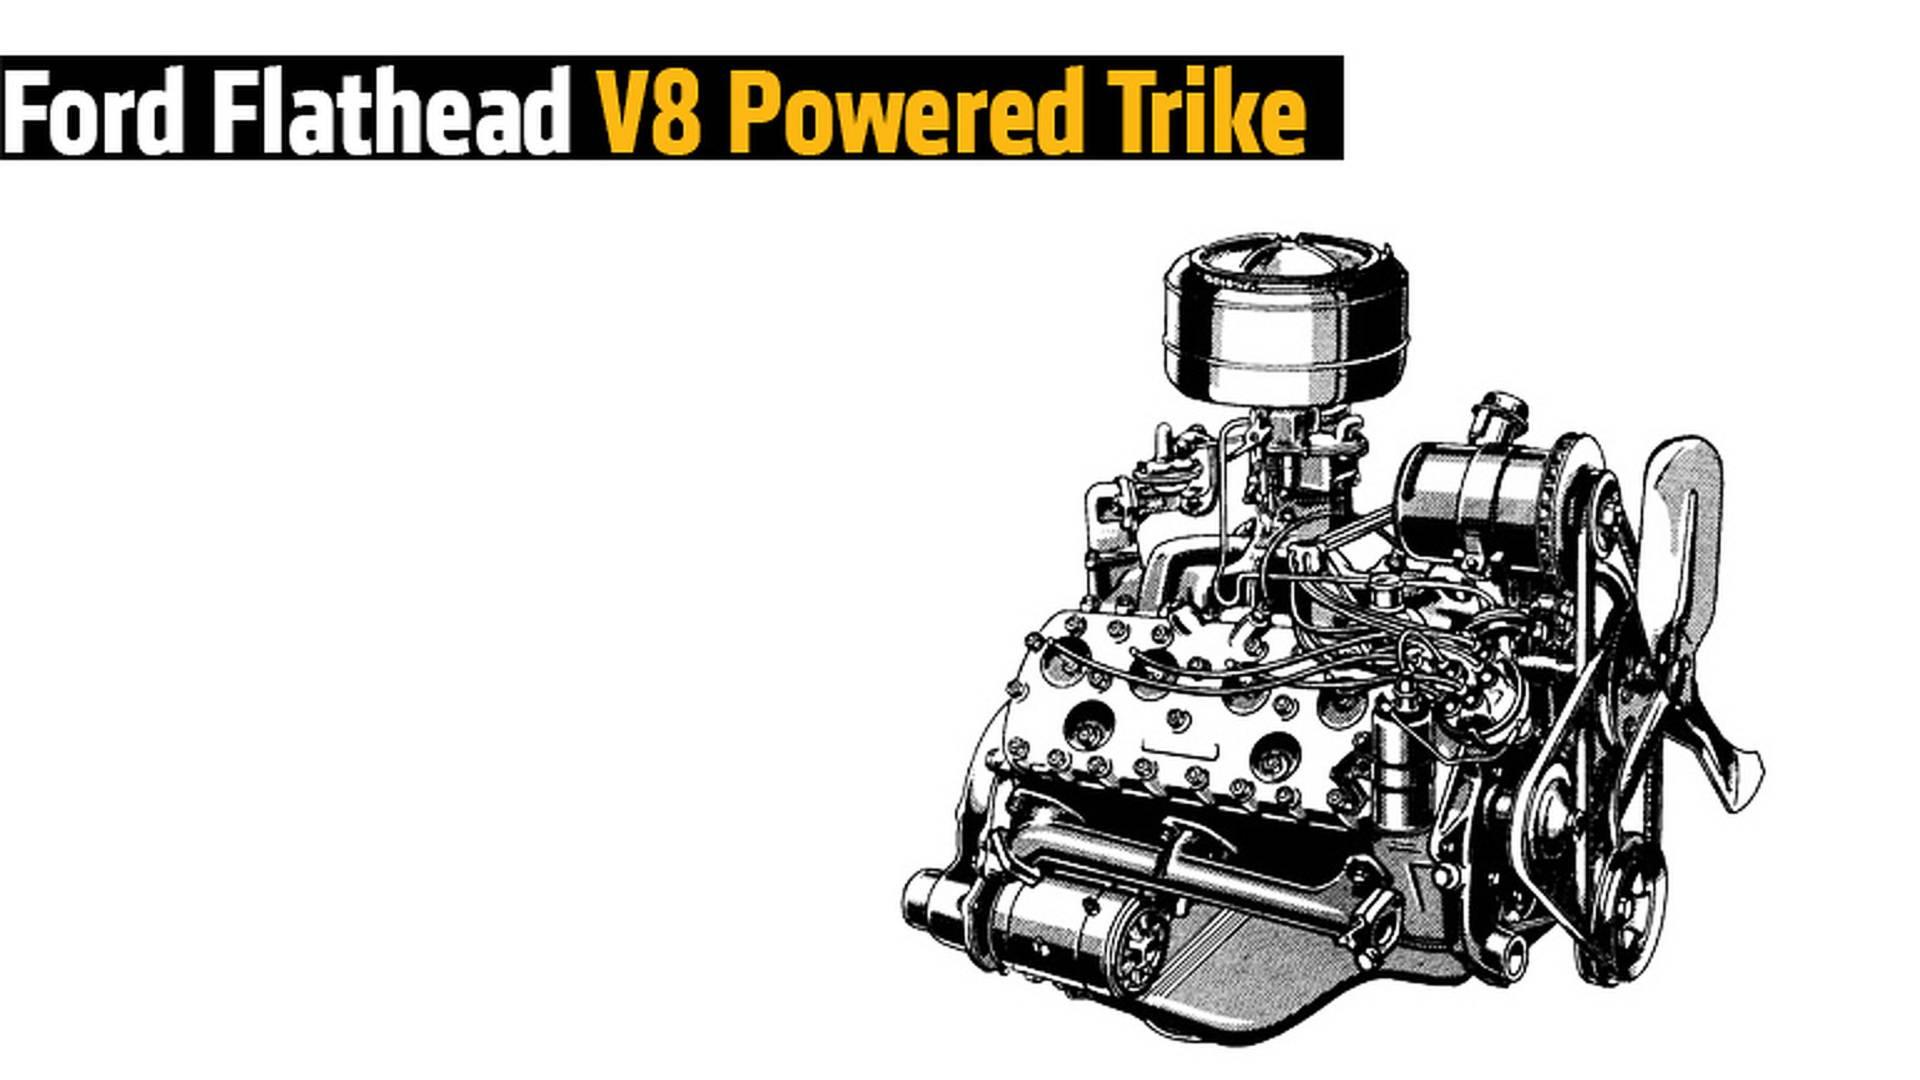 Ford Flathead V8 Powered Trike